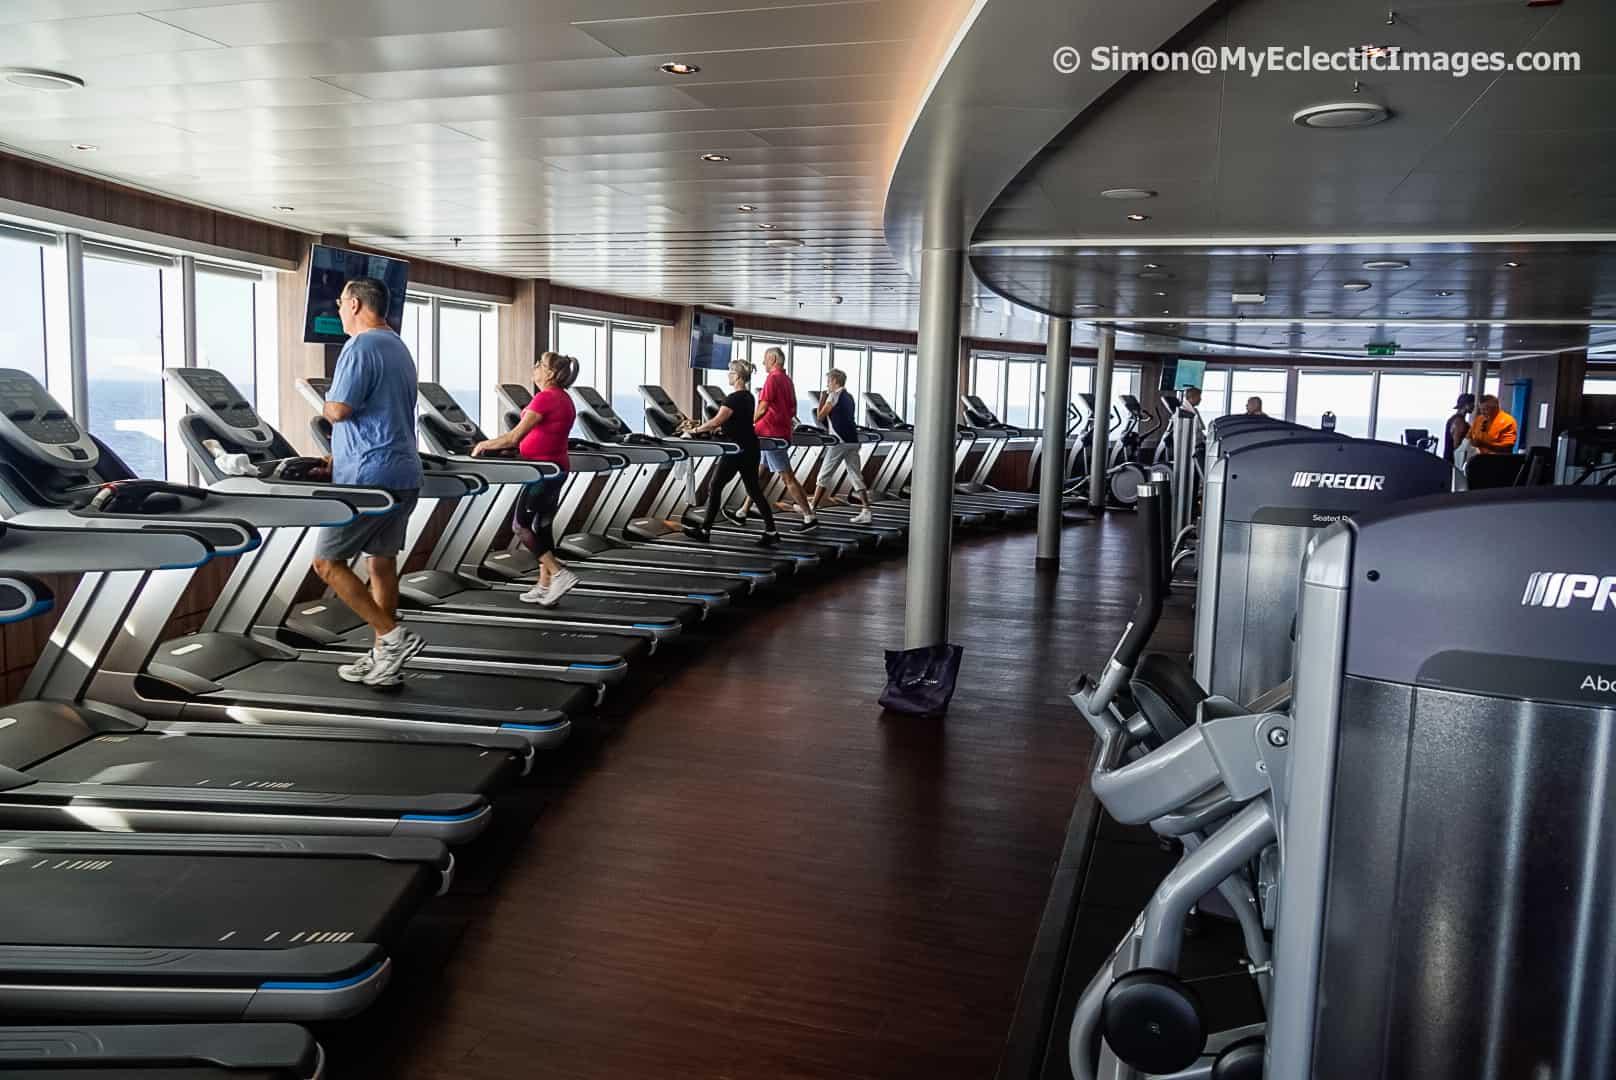 The Gym Aboard the Nieuw Statendam